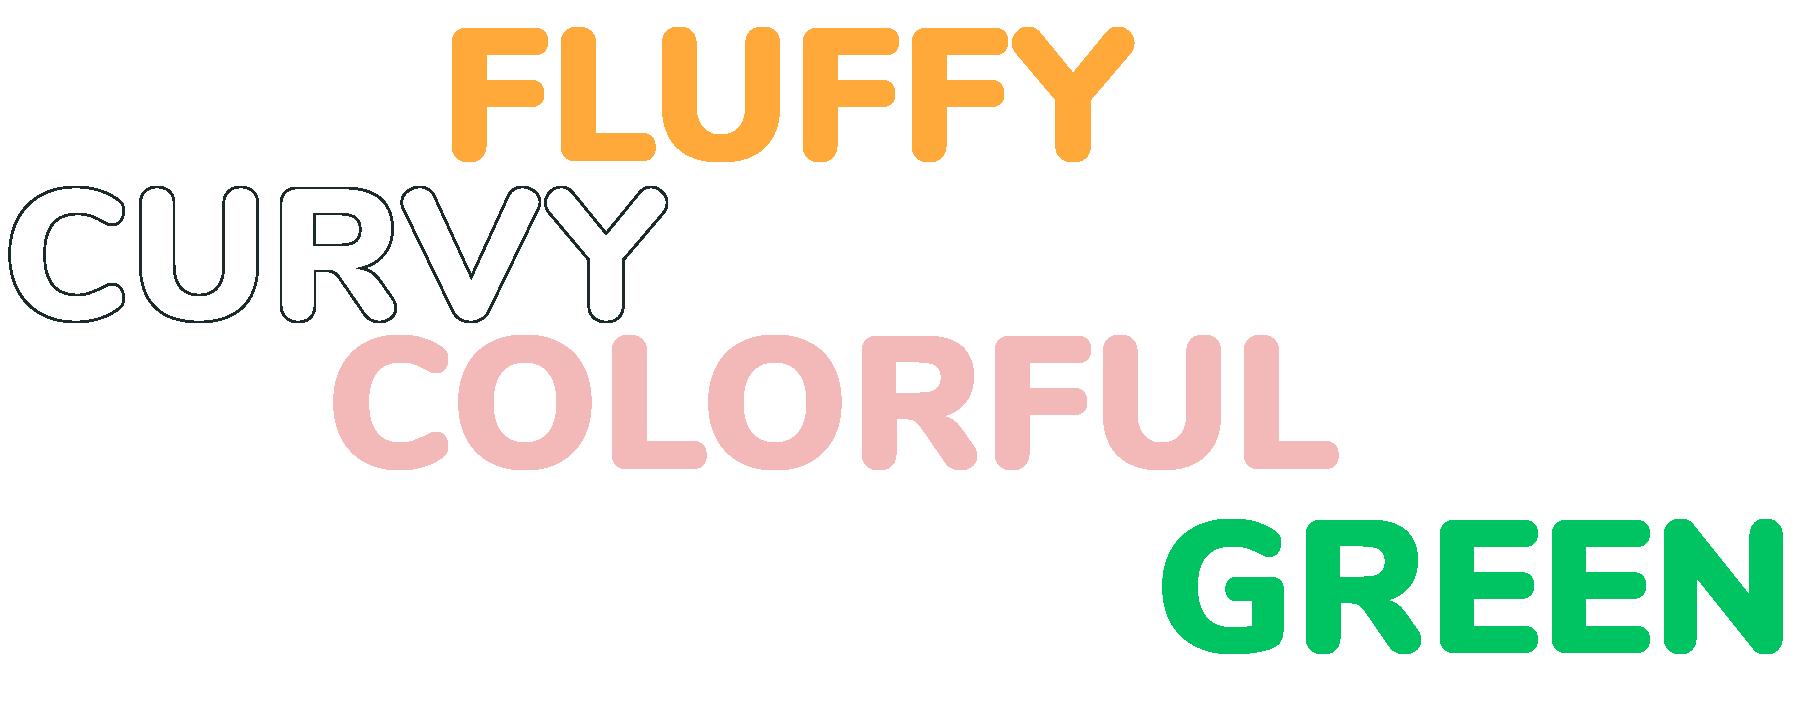 curvy fluffy colorful green